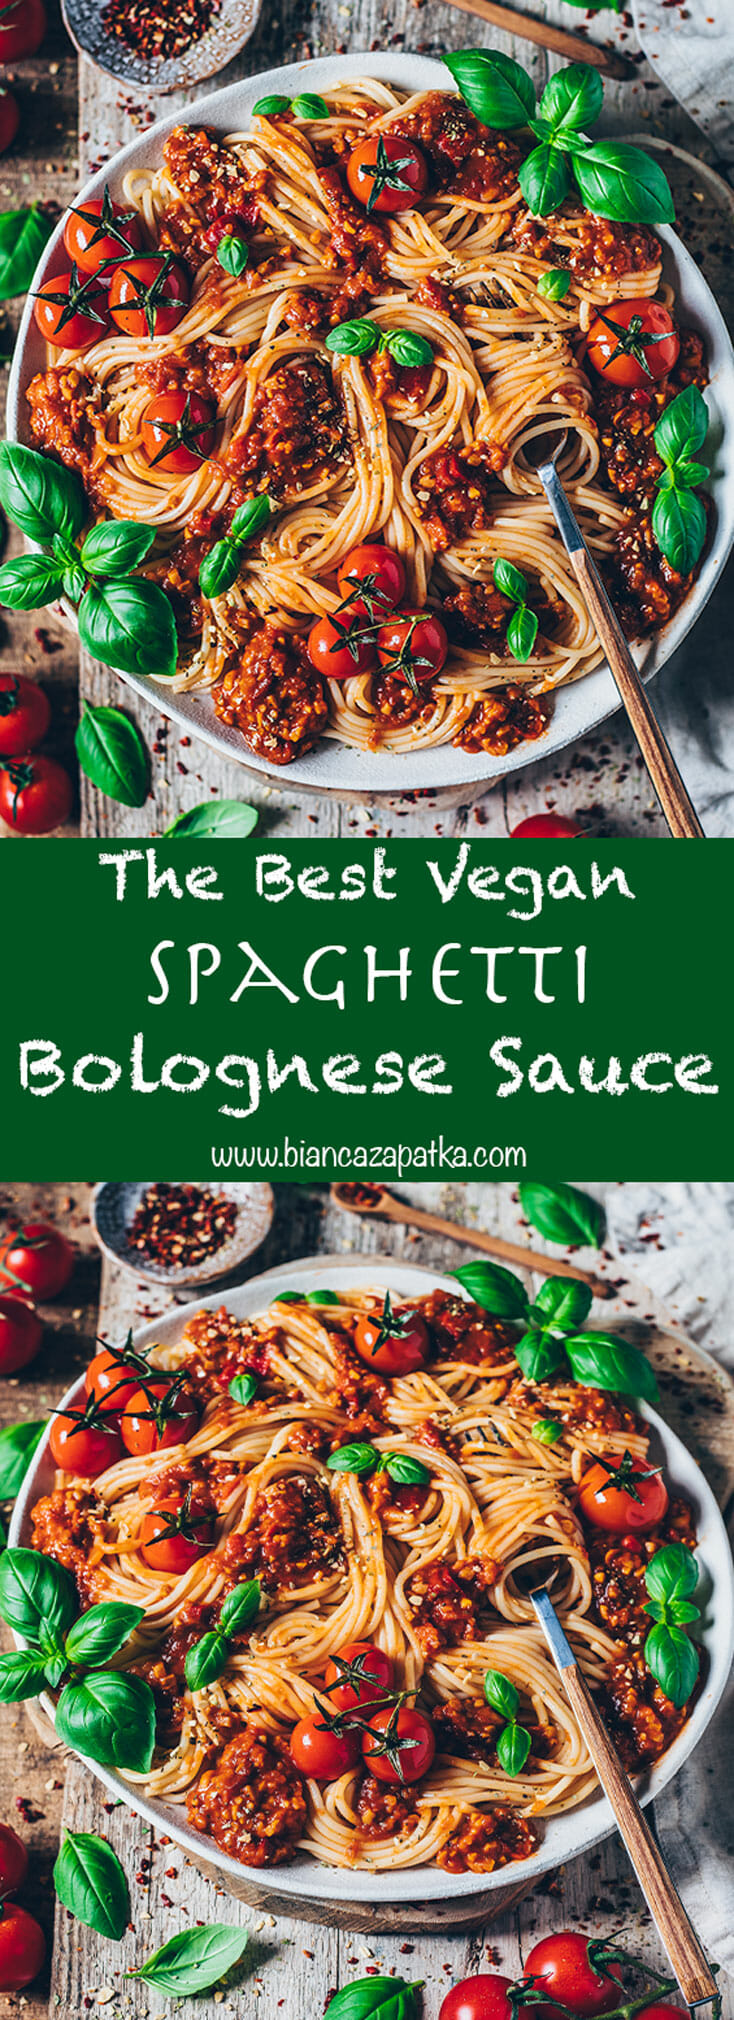 Vegan Spaghetti Bolognese Pasta Sauce